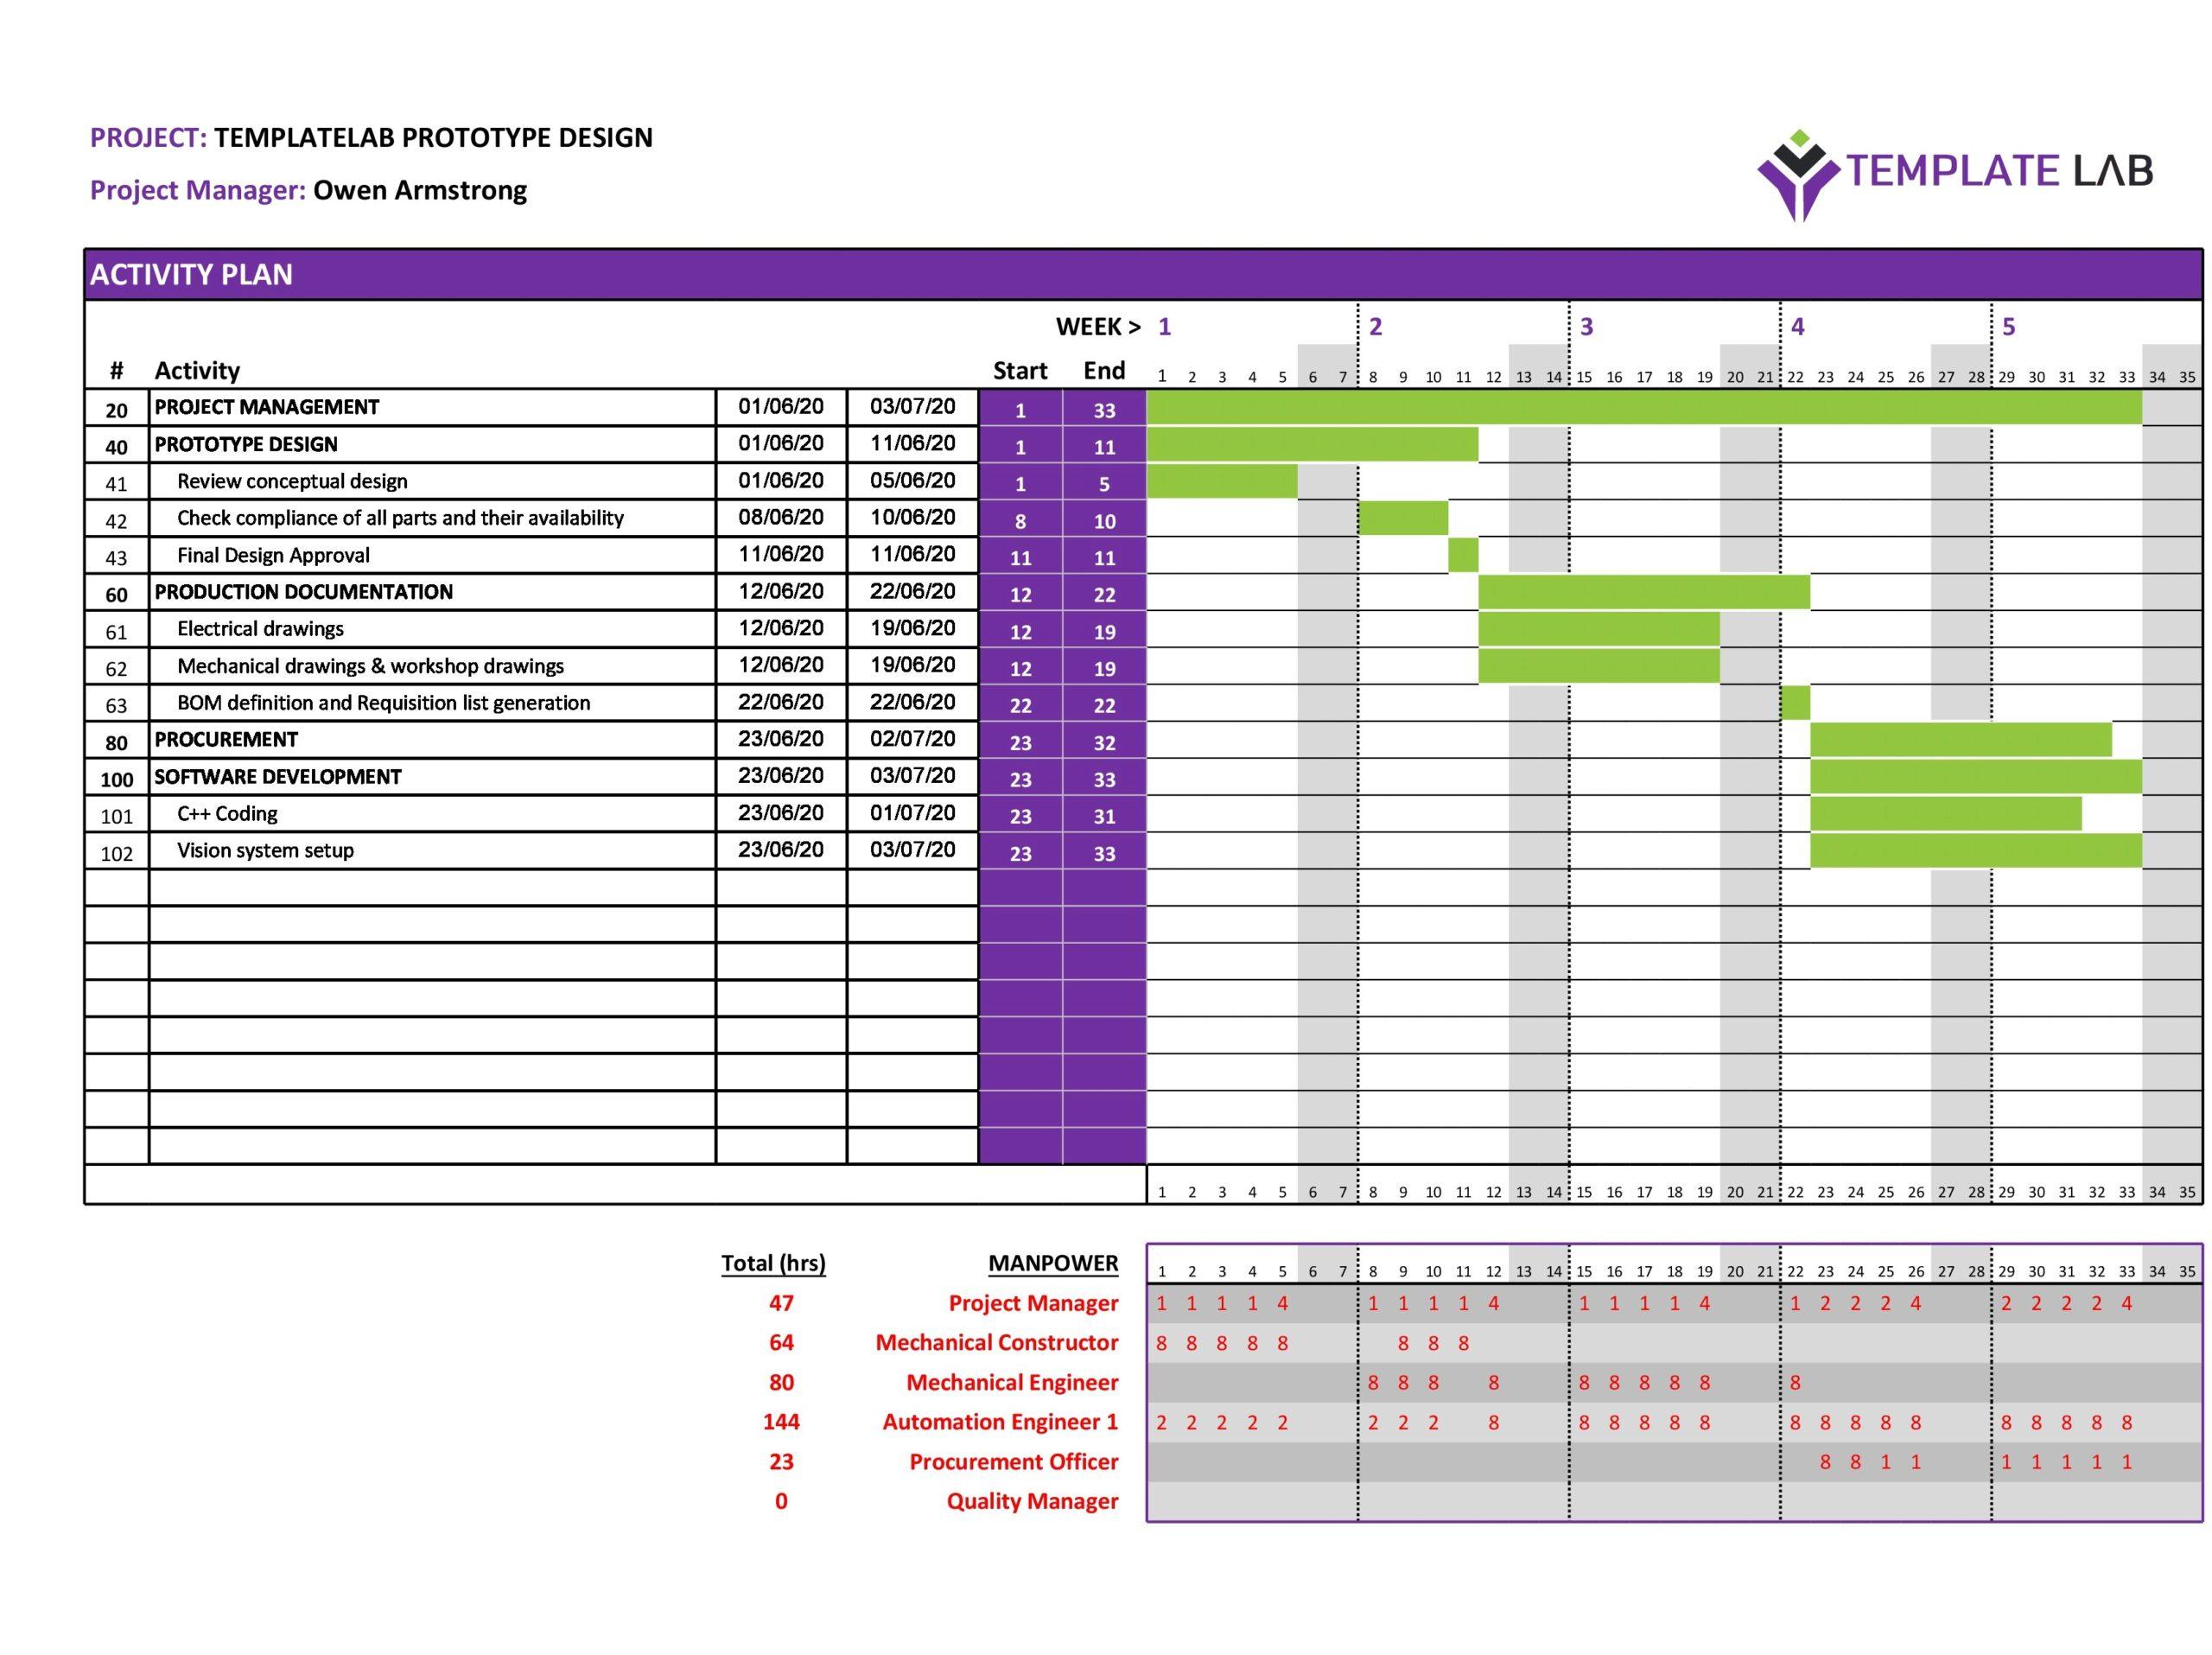 Free Project Ghantt Chart Template - TemplateLab.com